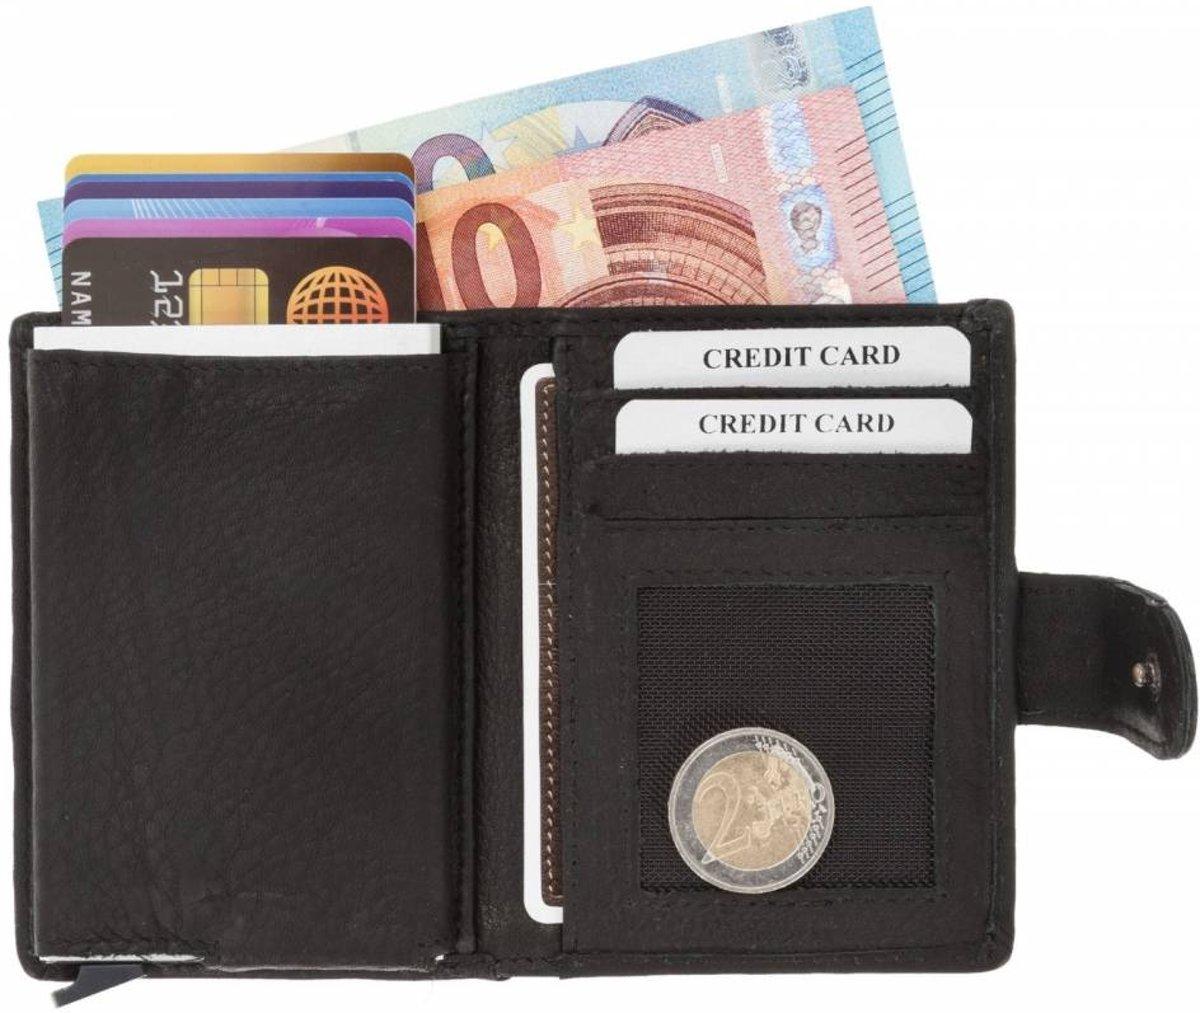 6ac4e81e5cf bol.com | Figuretta RFID Card Protector Creditcardhouder - Leer - Zwart